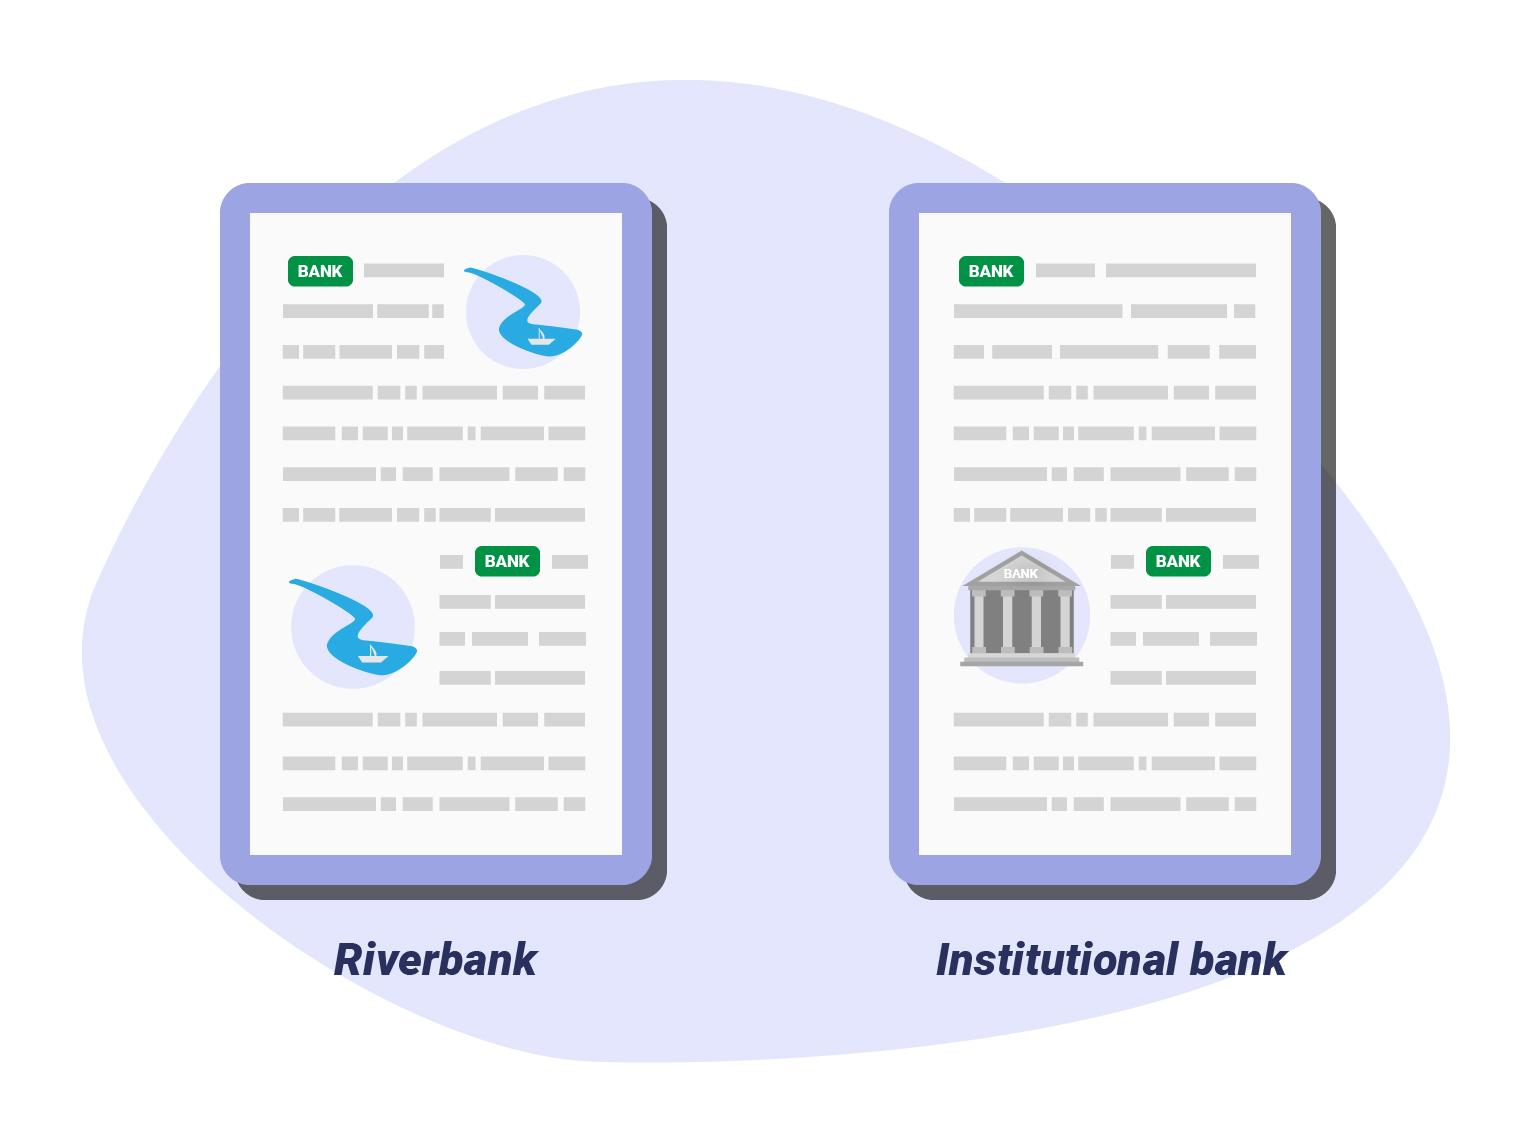 bank vs riverbank vs intitutional bank - polysemic keywords